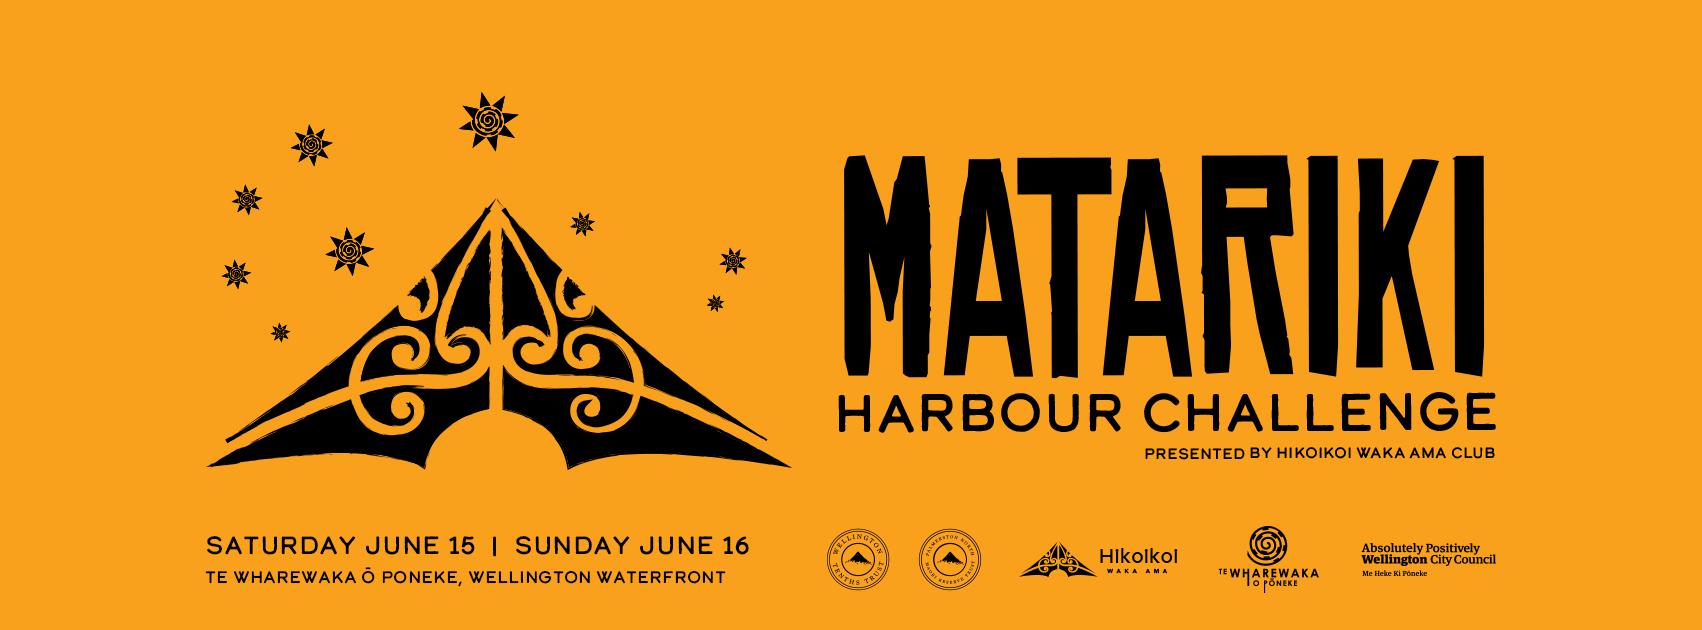 Matariki Harbour Challenge Banner.png